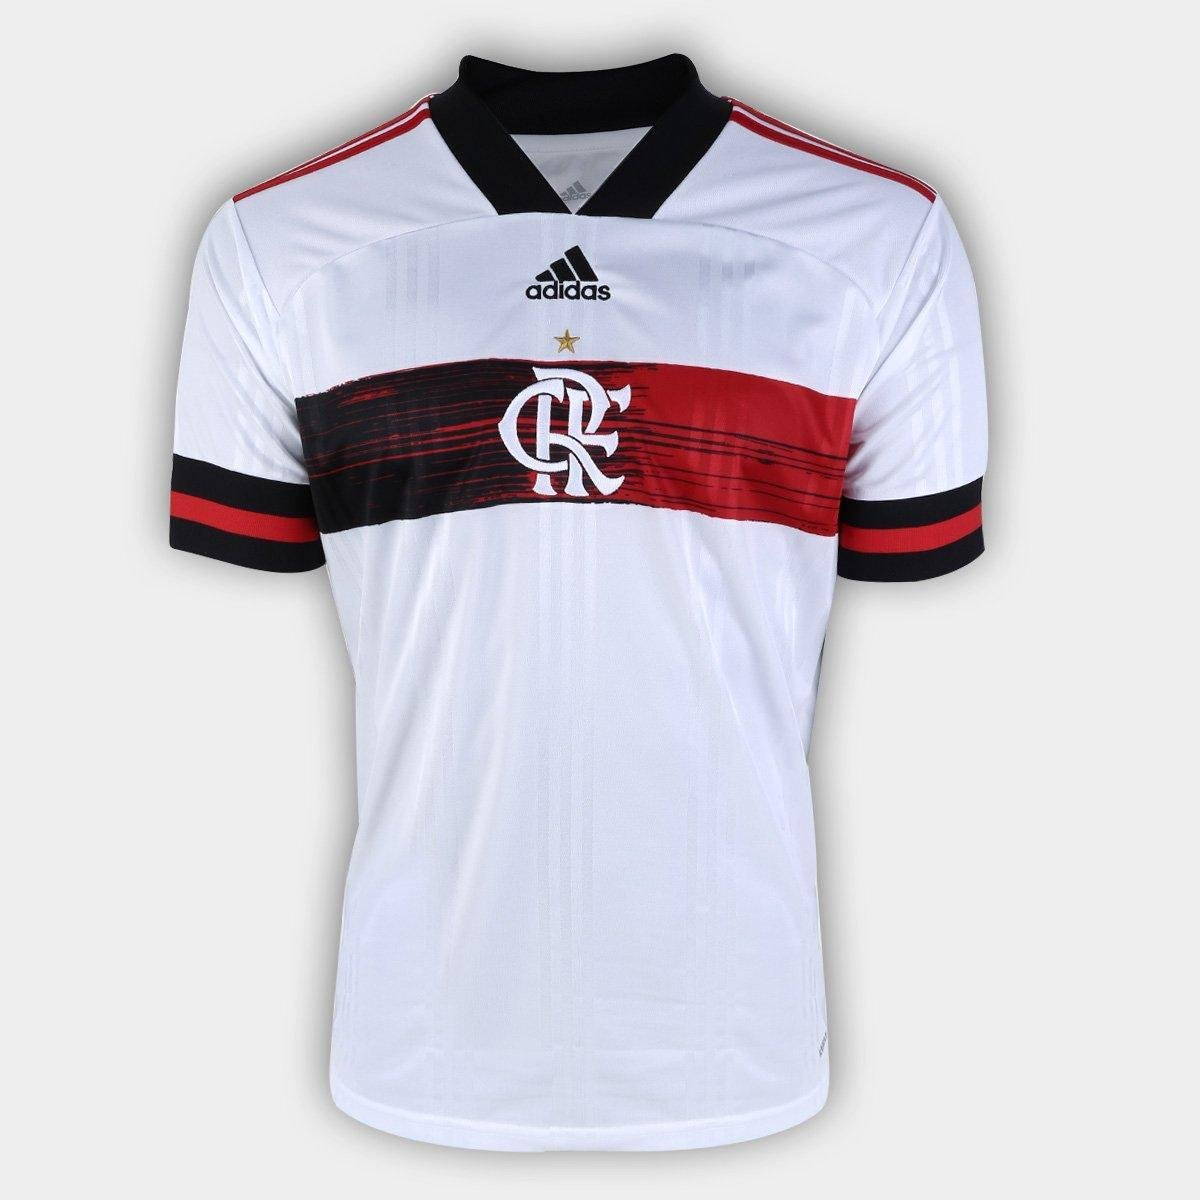 Camisa Flamengo II 20/21 s/n° Torcedor Adidas Masculina - Branco